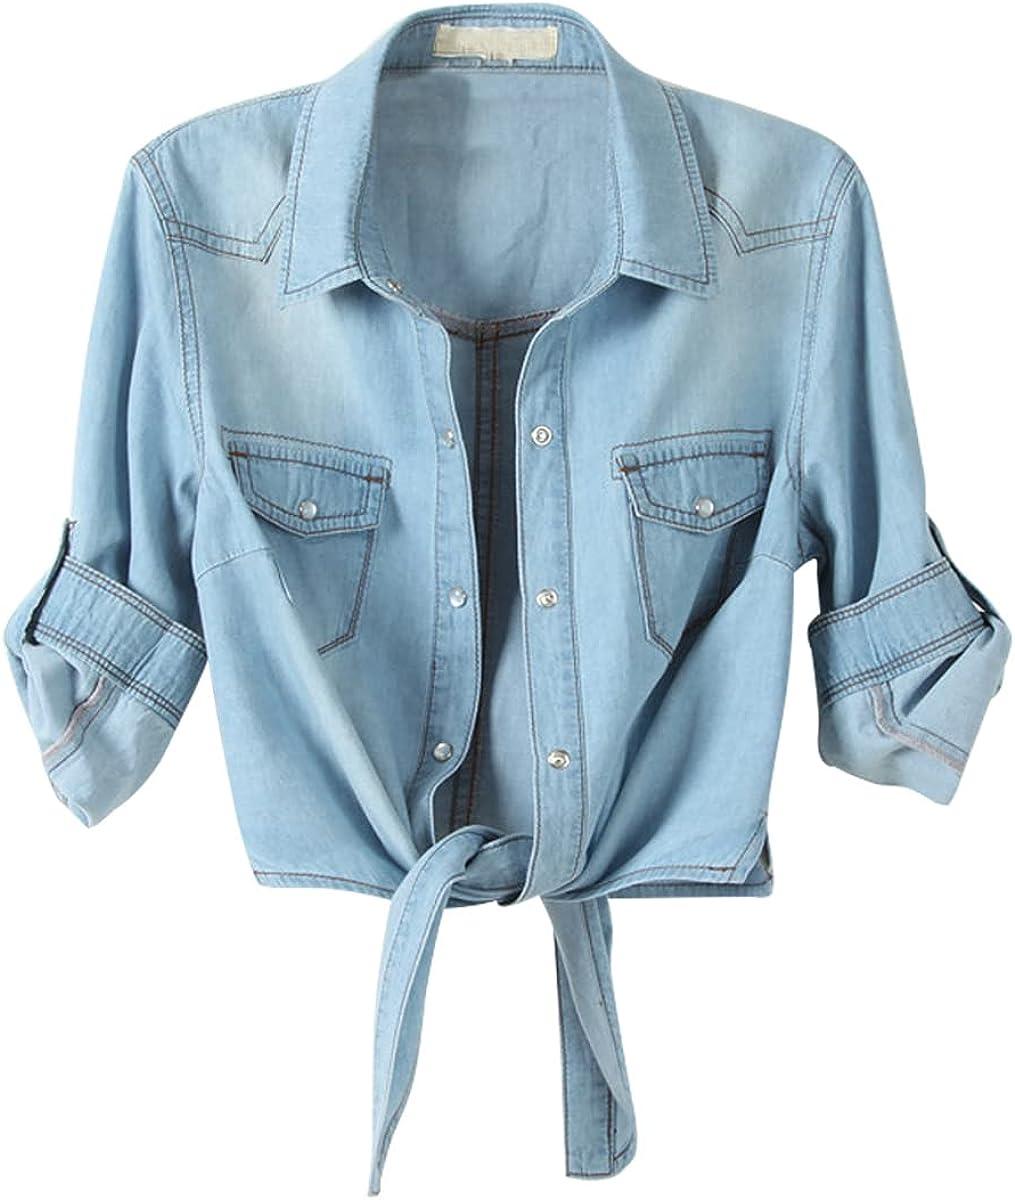 SeekMe Womens Denim Shirts Tie Front Crop Top Button Down Chambray Jean Shirt Cardigan